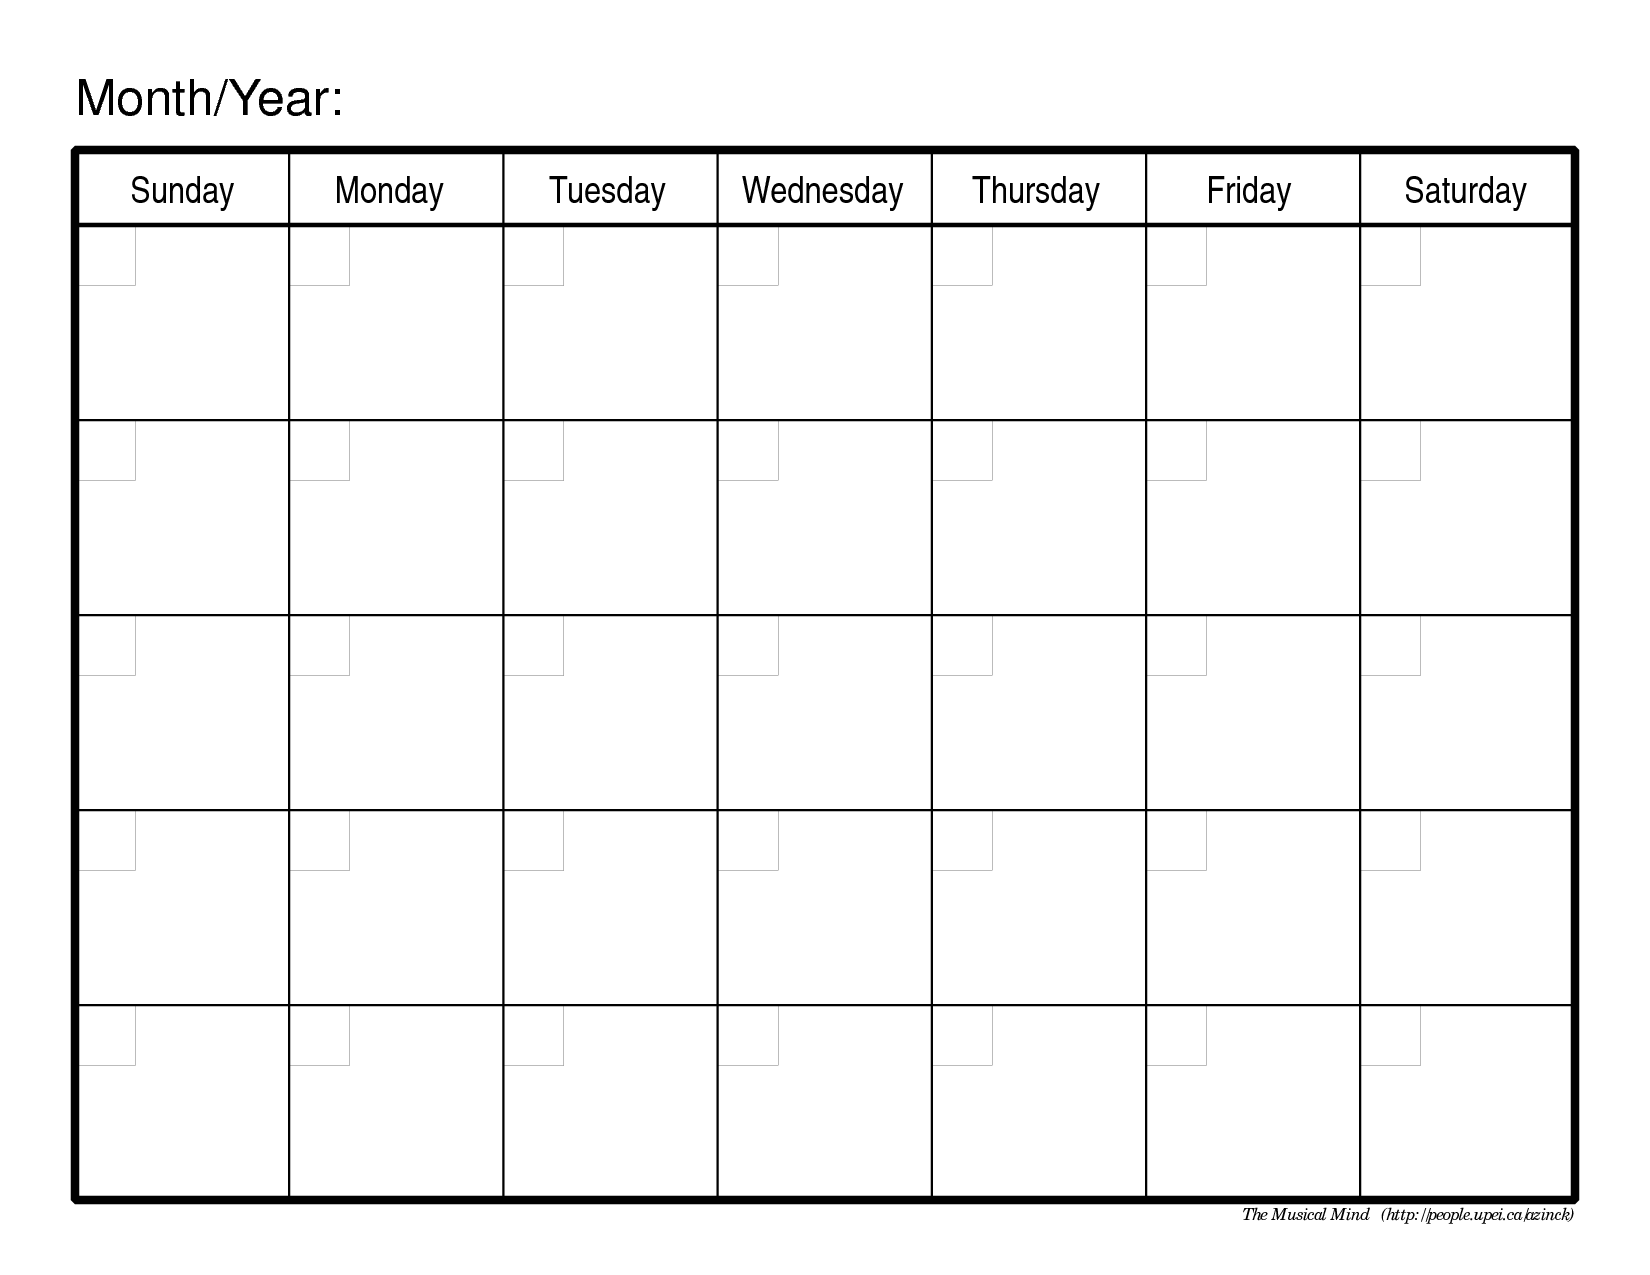 Printable Calendar | Fotolip.com Rich image and wallpaper